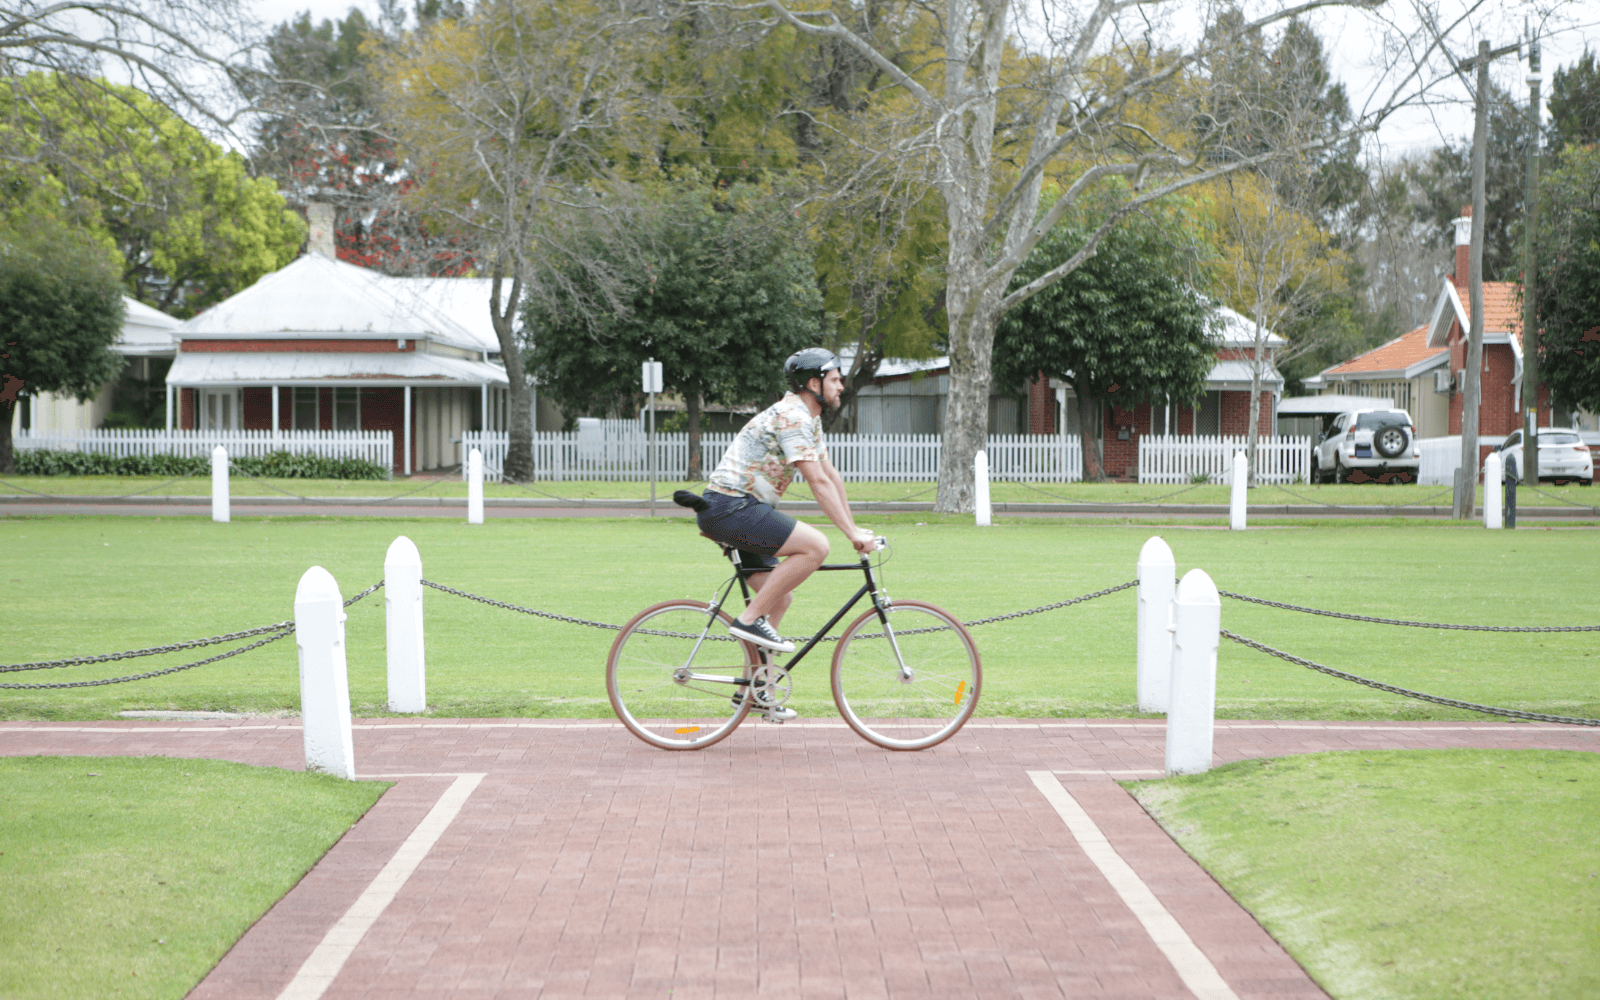 Copy of Copy of Lifestyle images 22 1 - Reid ® - Wayfarer Bike